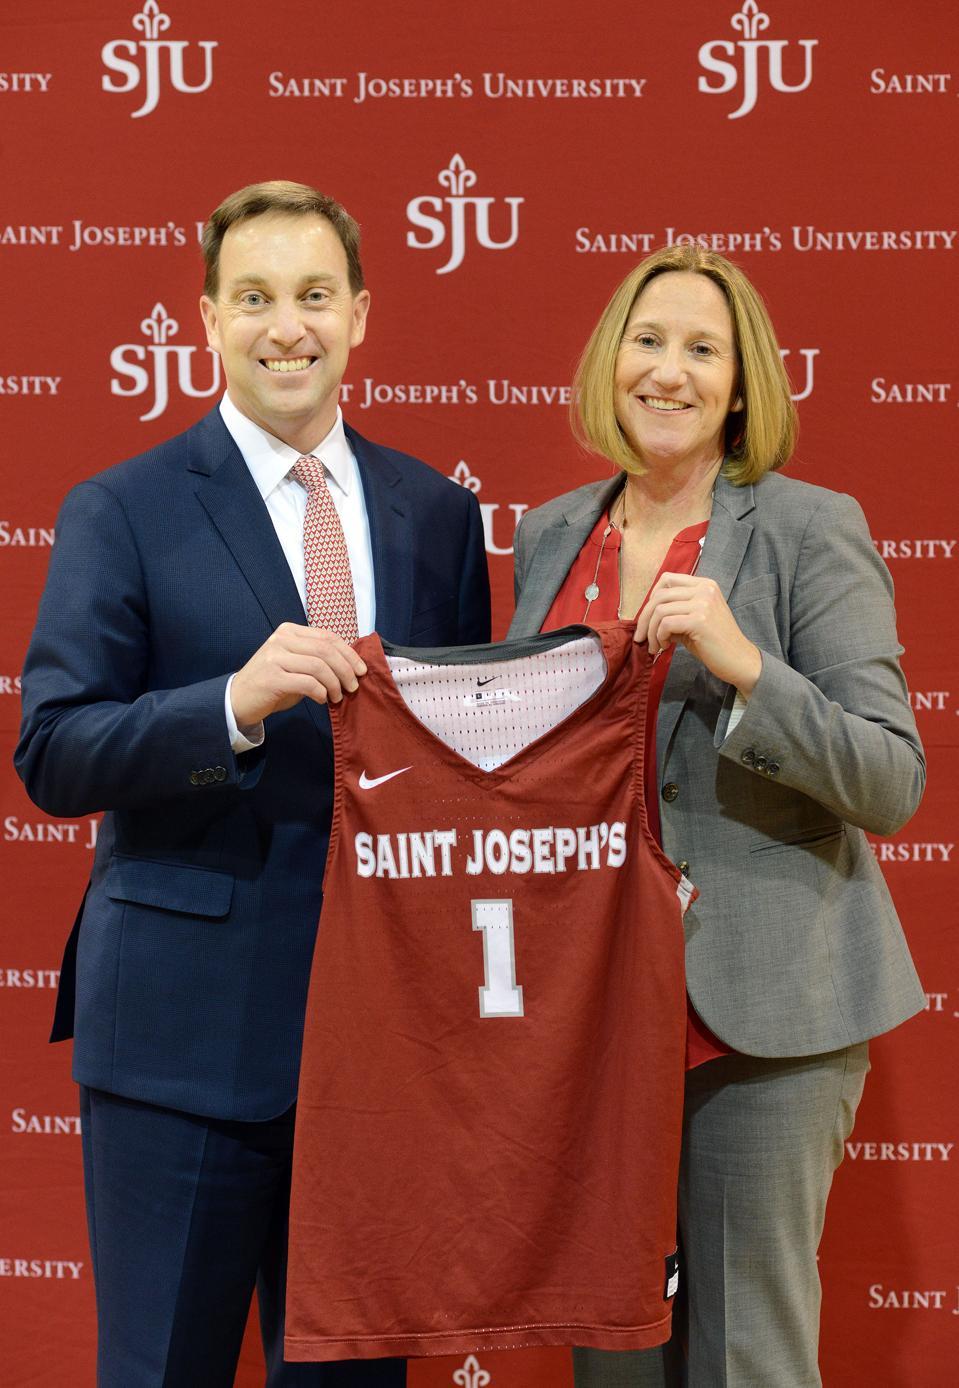 Saint Joseph's University Names Jill Bodensteiner New Athletics Director